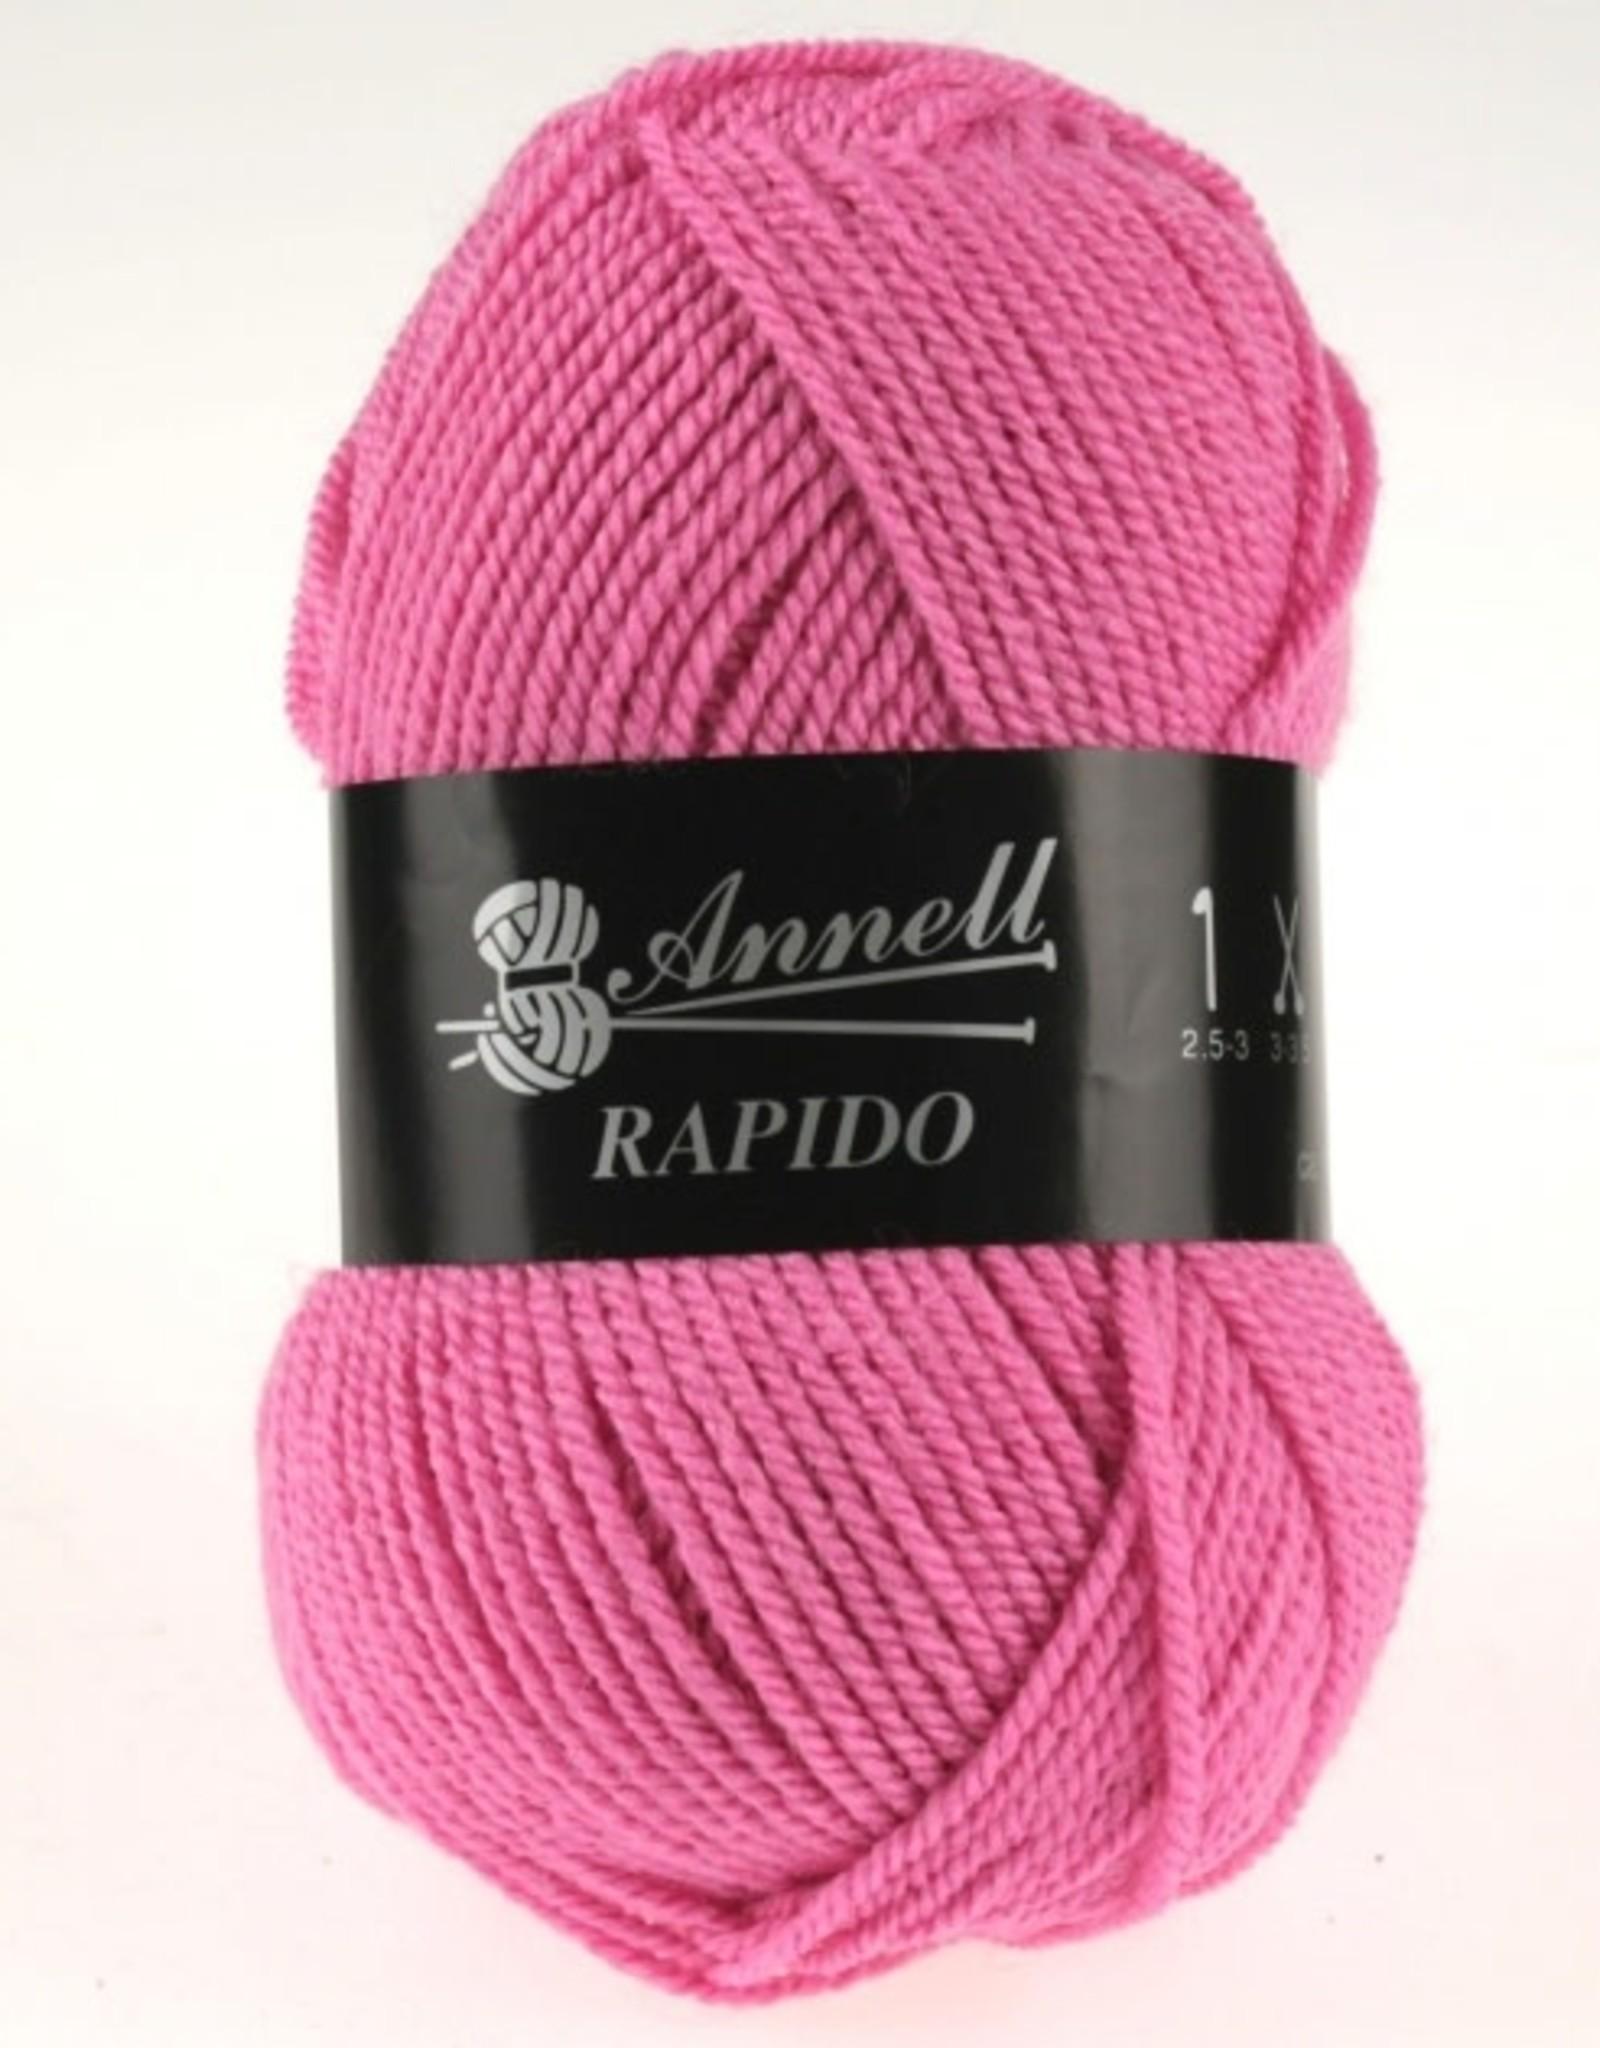 Annell Annell rapido 3277